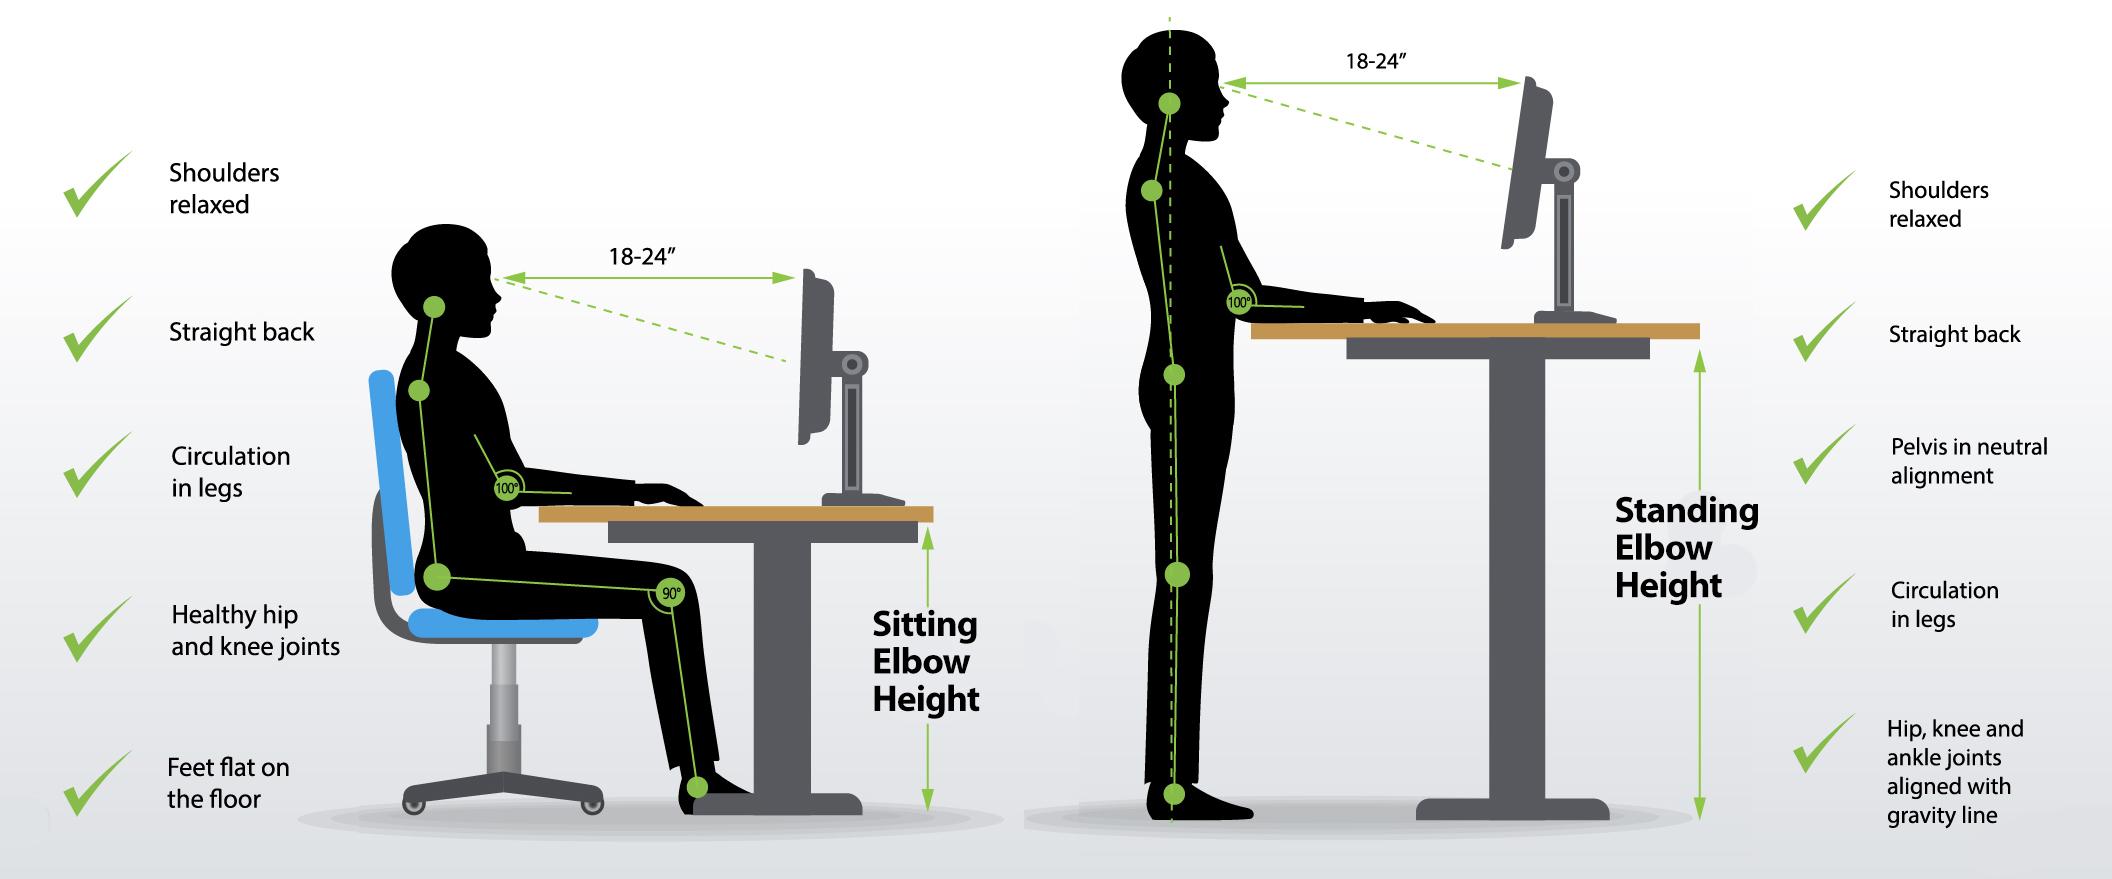 Proper desk ergonomics for sitting and standing